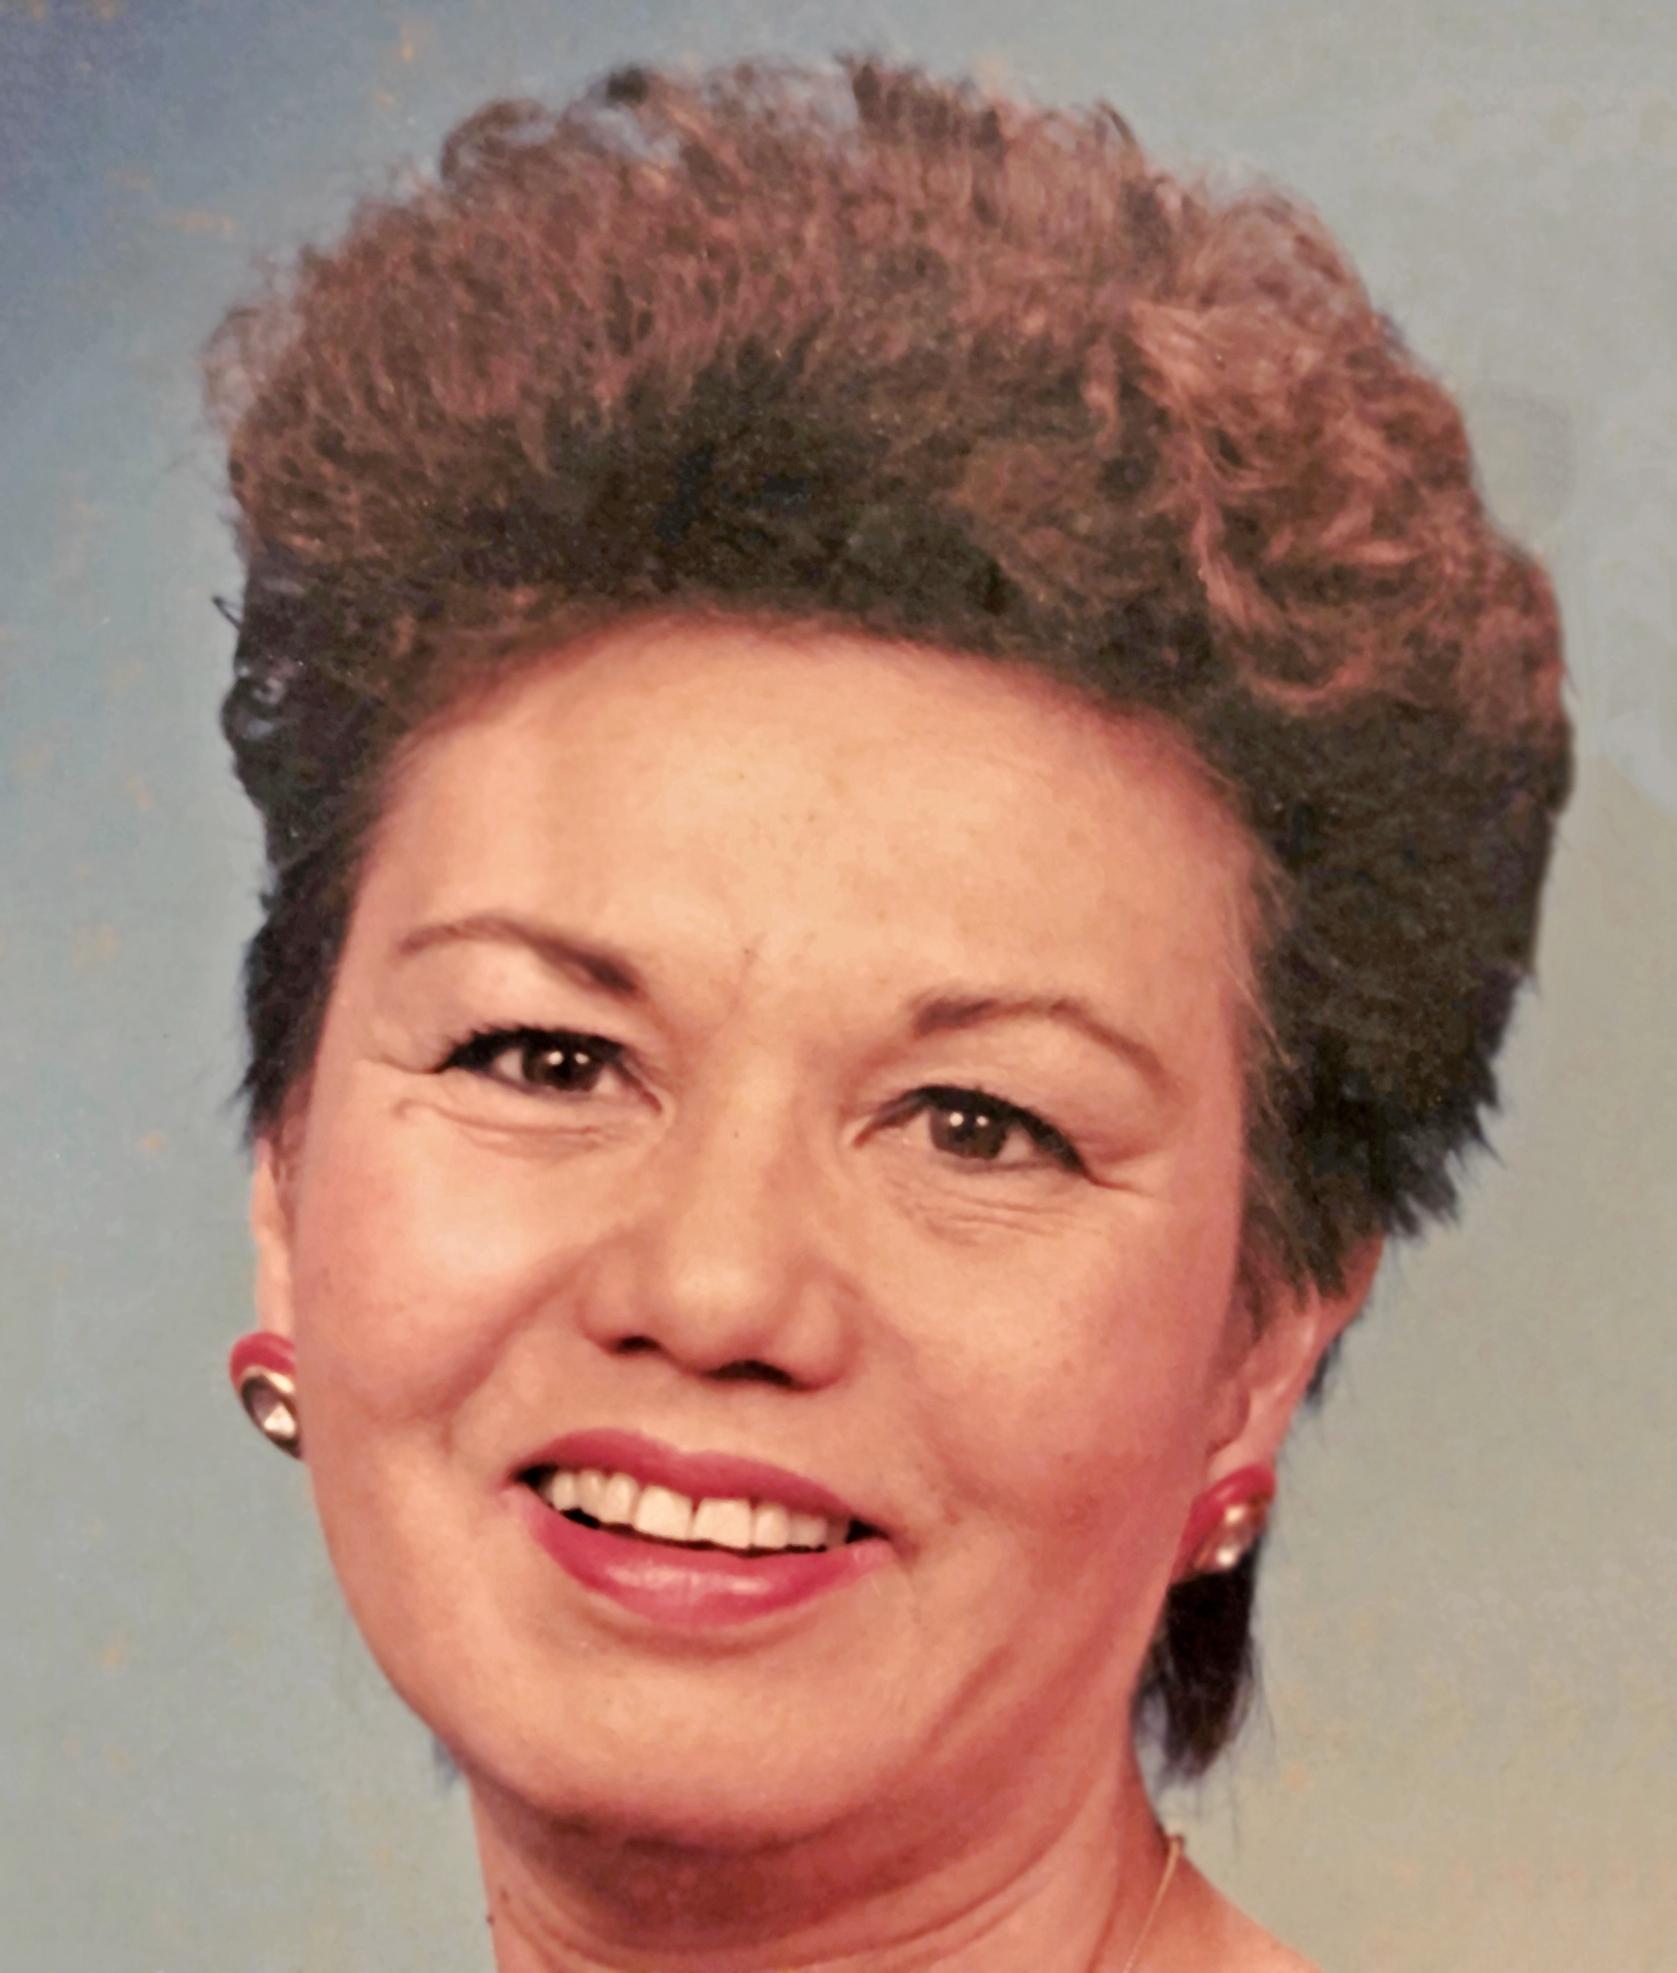 CAROL ALMETA WARDEN